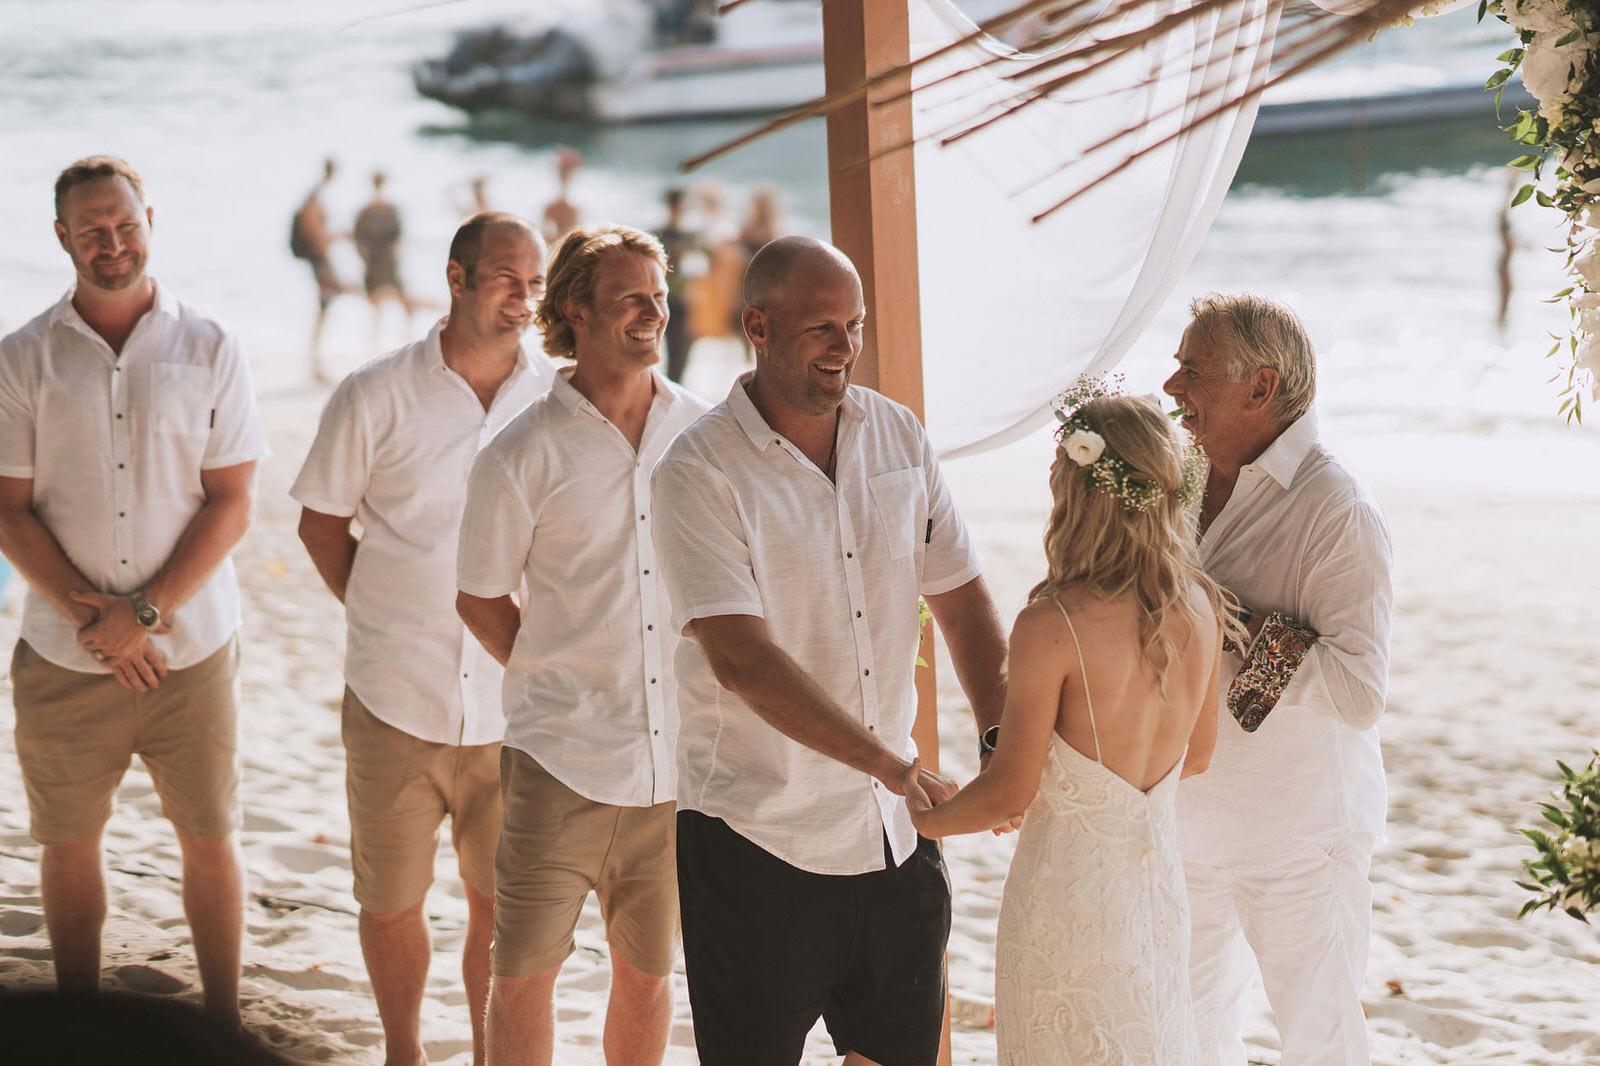 newfound-hai-tide-nusa-lembongan-bali-wedding-photographers-112